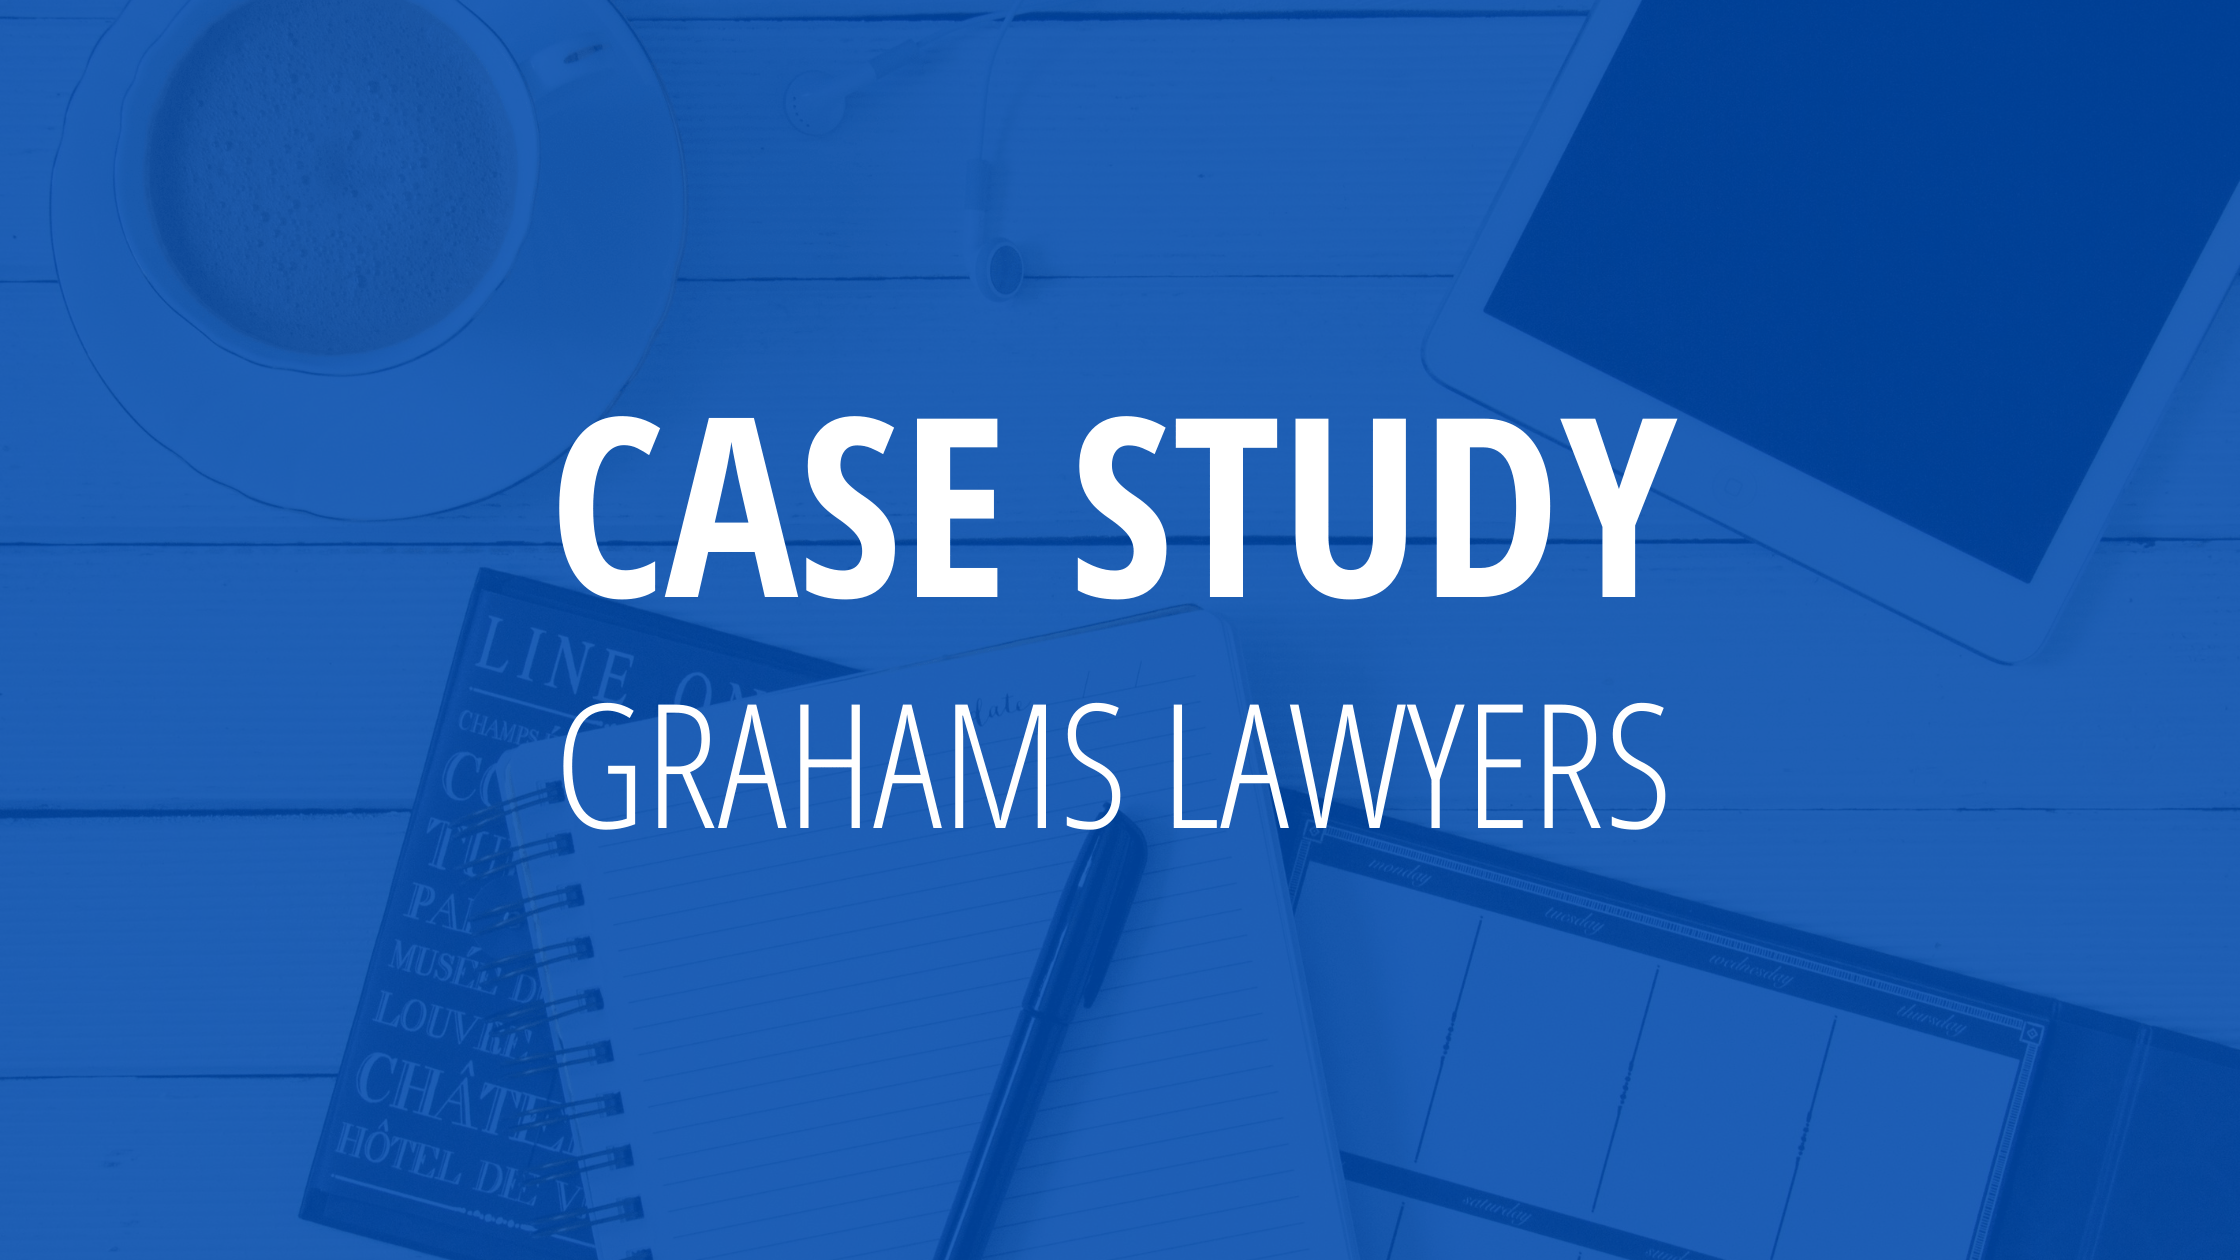 grahams lawyers case study